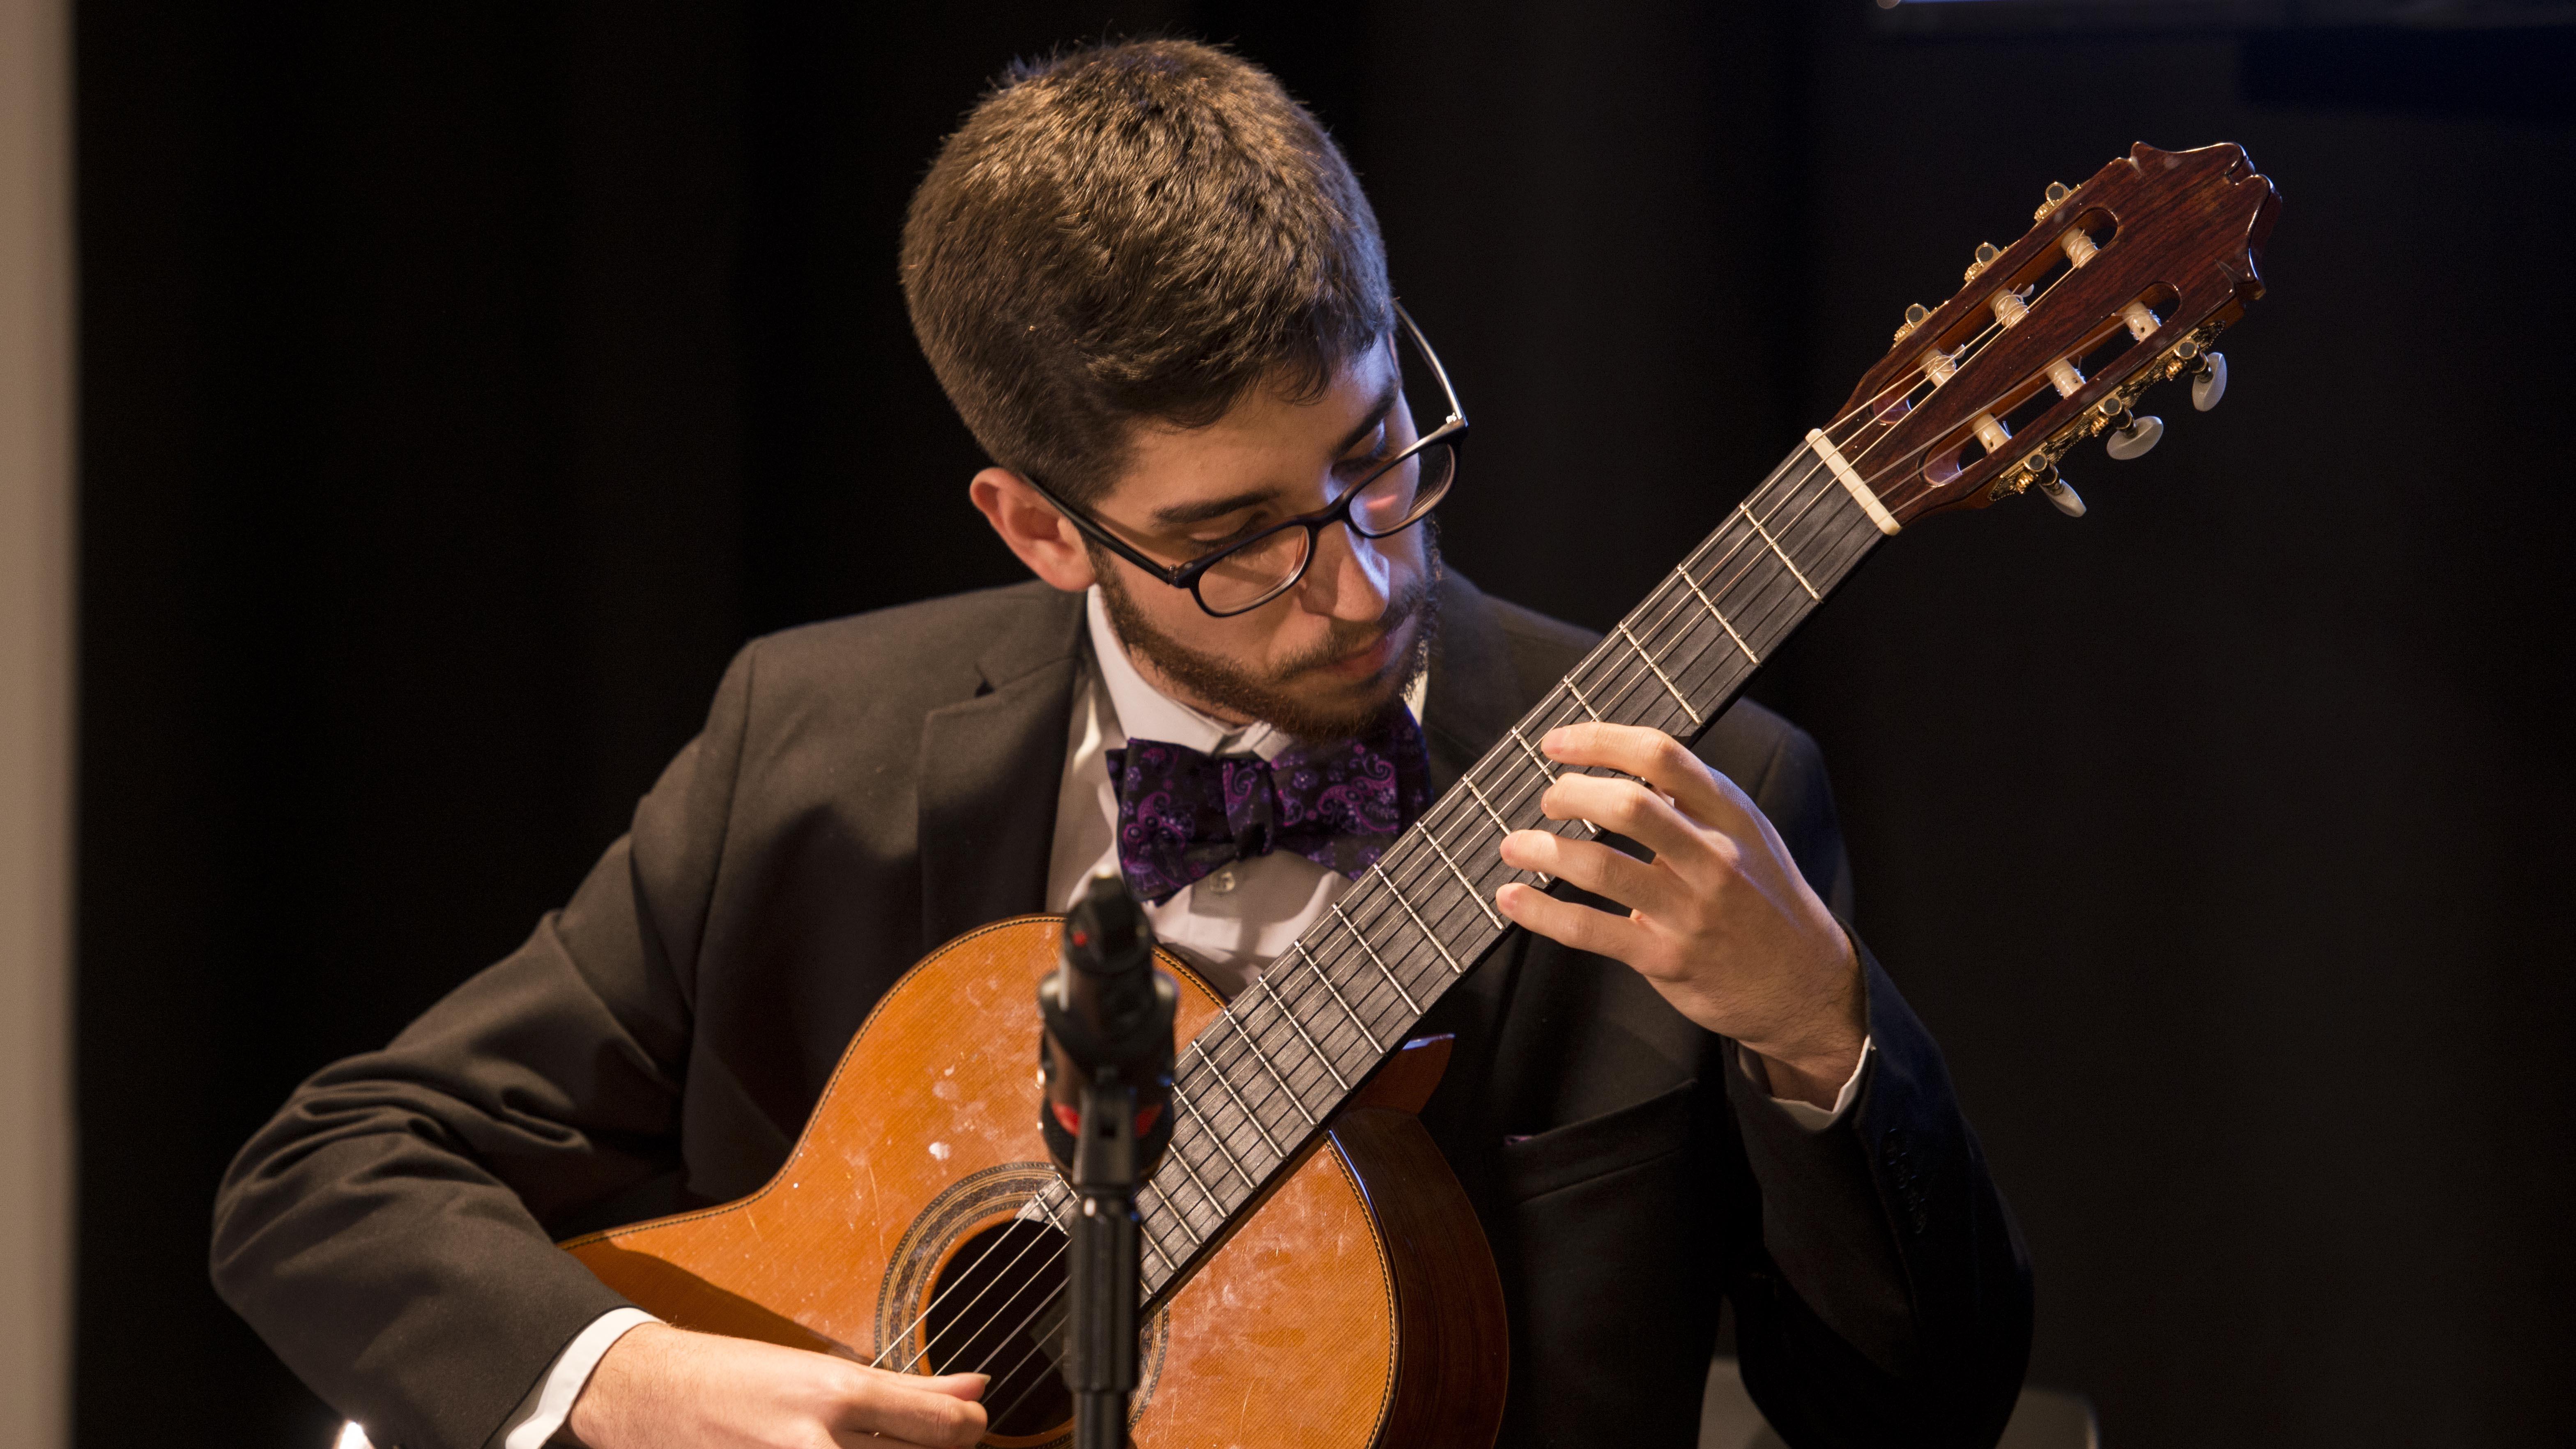 Andrés Lopez Moreno playing guitar